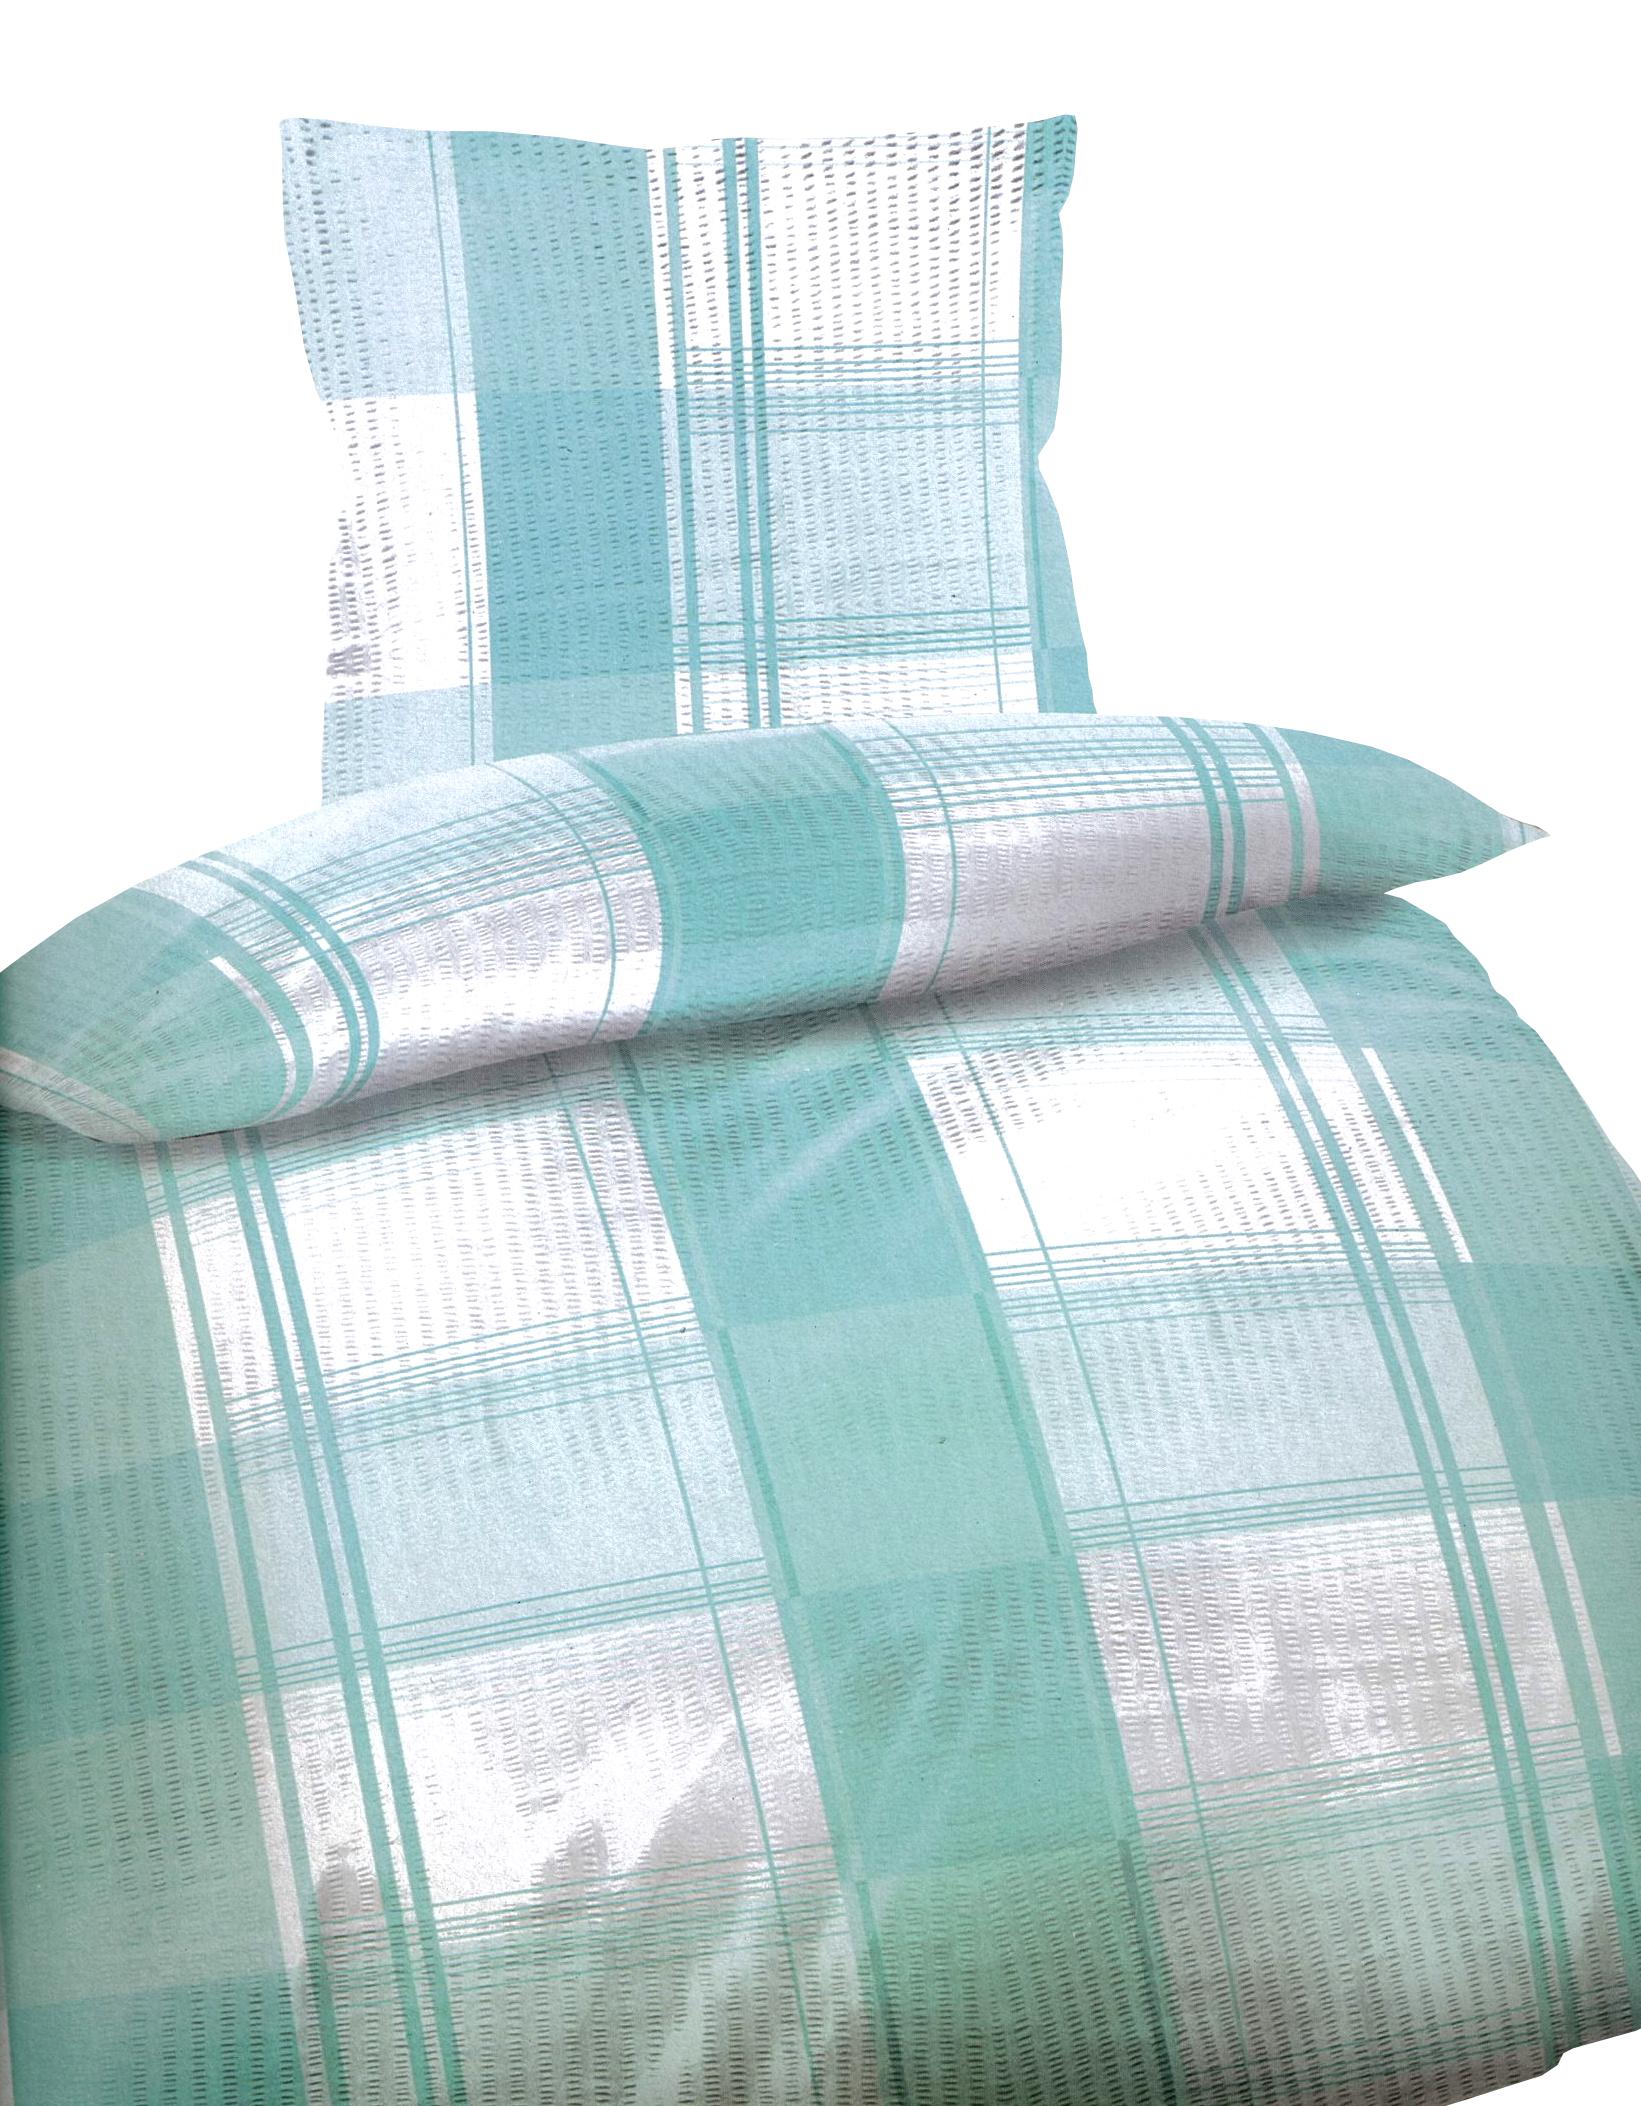 4 tlg bettw sche microfaser seersucker 135x200 cm gestreift t rkis wei doppelpack. Black Bedroom Furniture Sets. Home Design Ideas